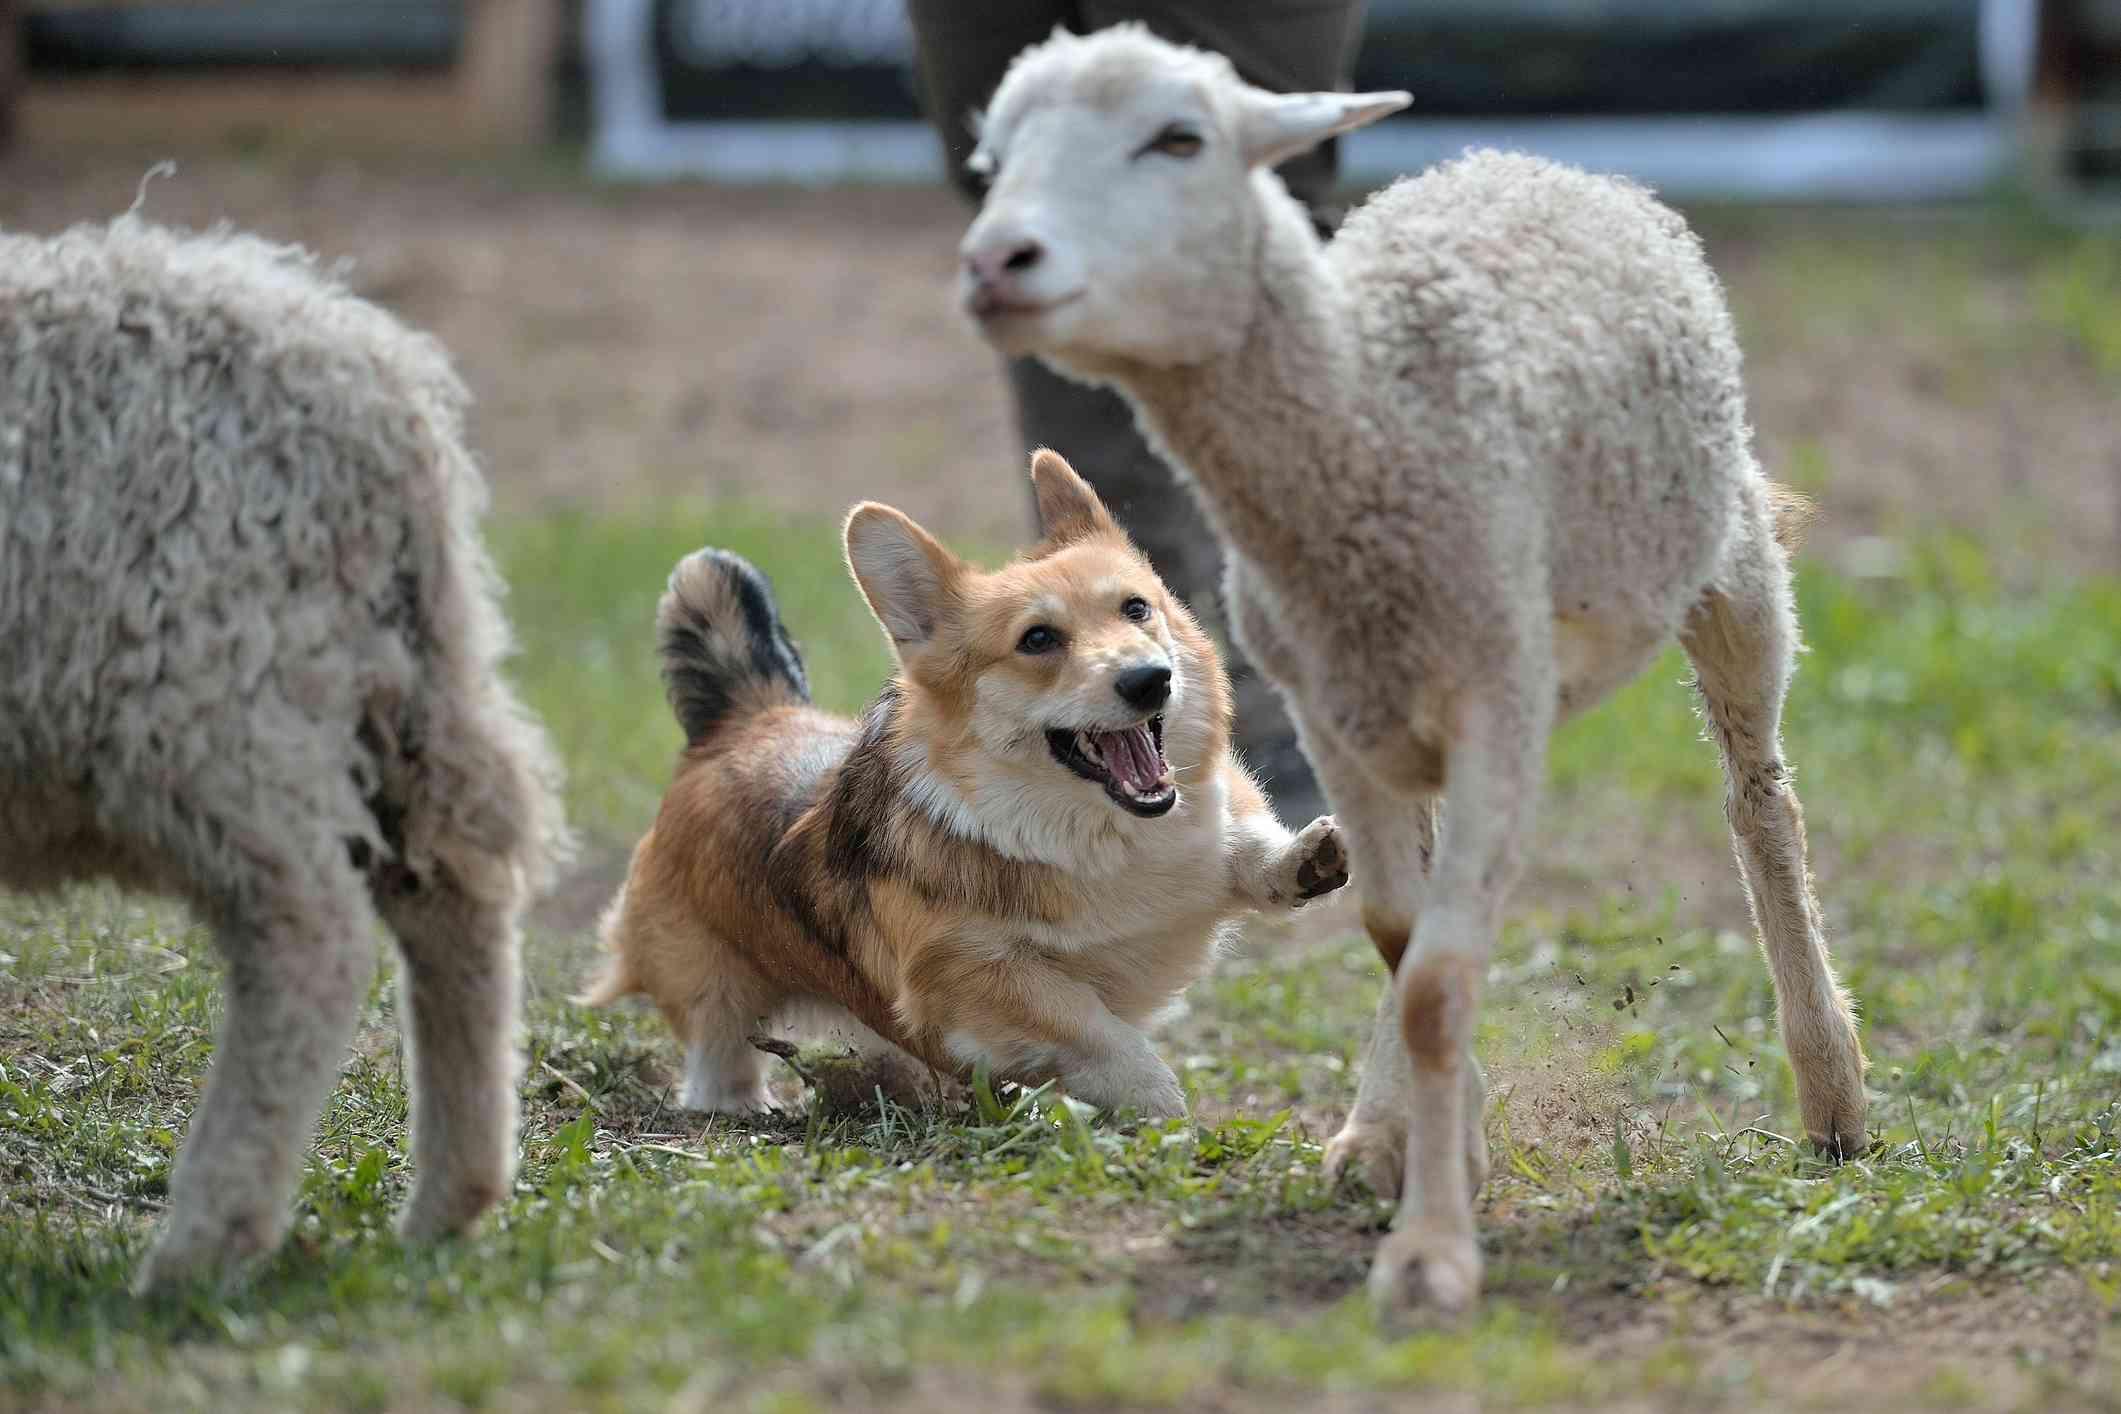 Pembroke Welsh Corgi pastoreando ovejas